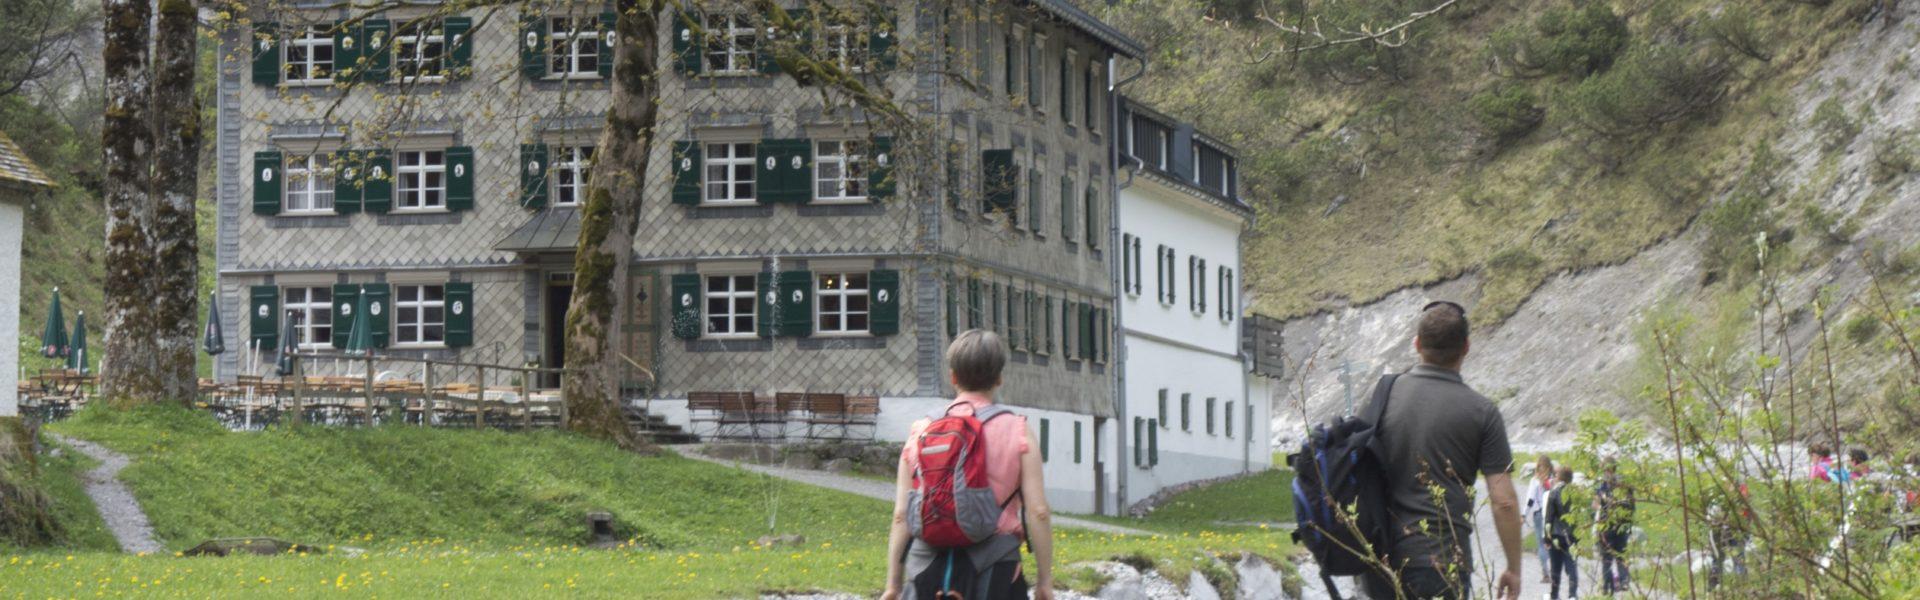 GVA-Fachworkshop-Naturvermittlung-Grosses-Walsertal